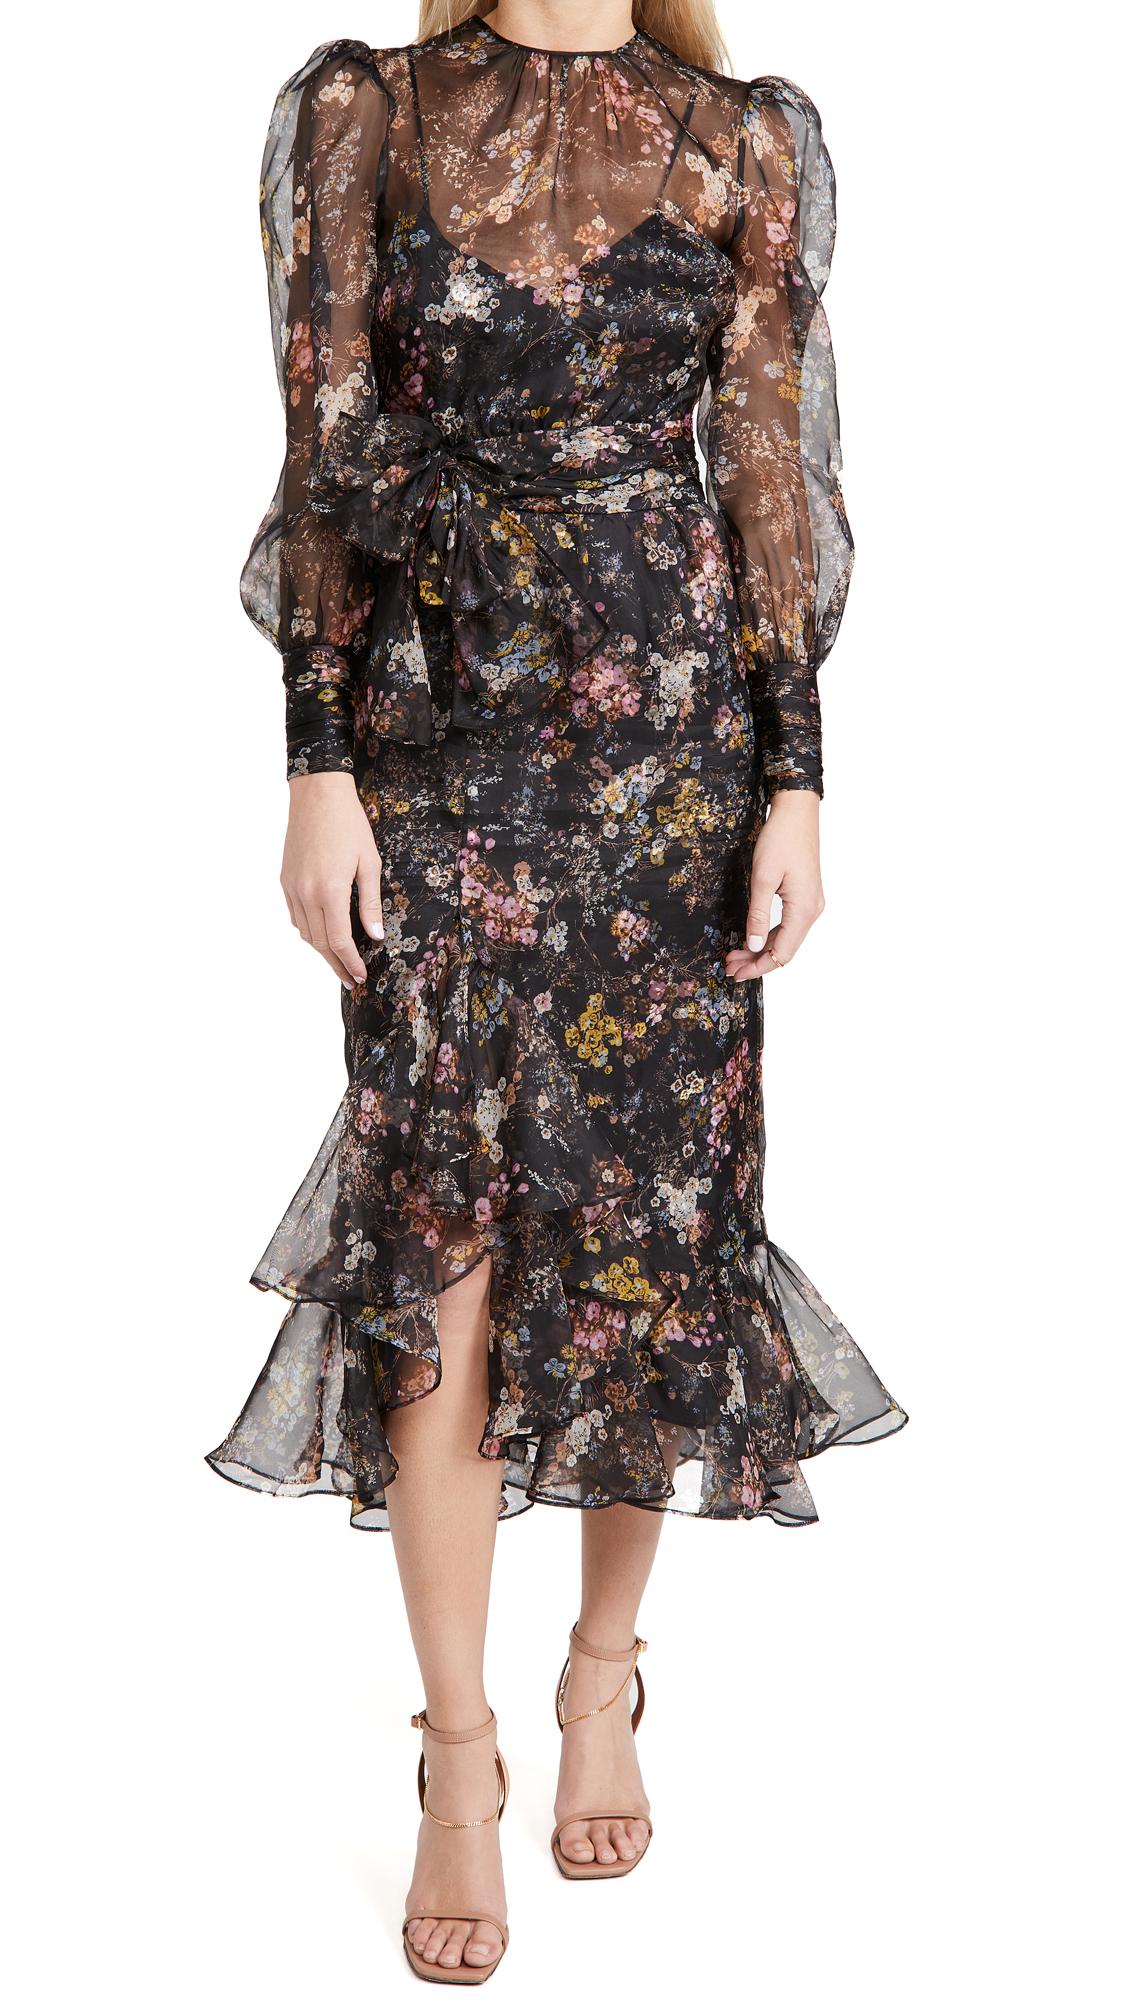 CINQ À SEPT MARIANNE DRESS